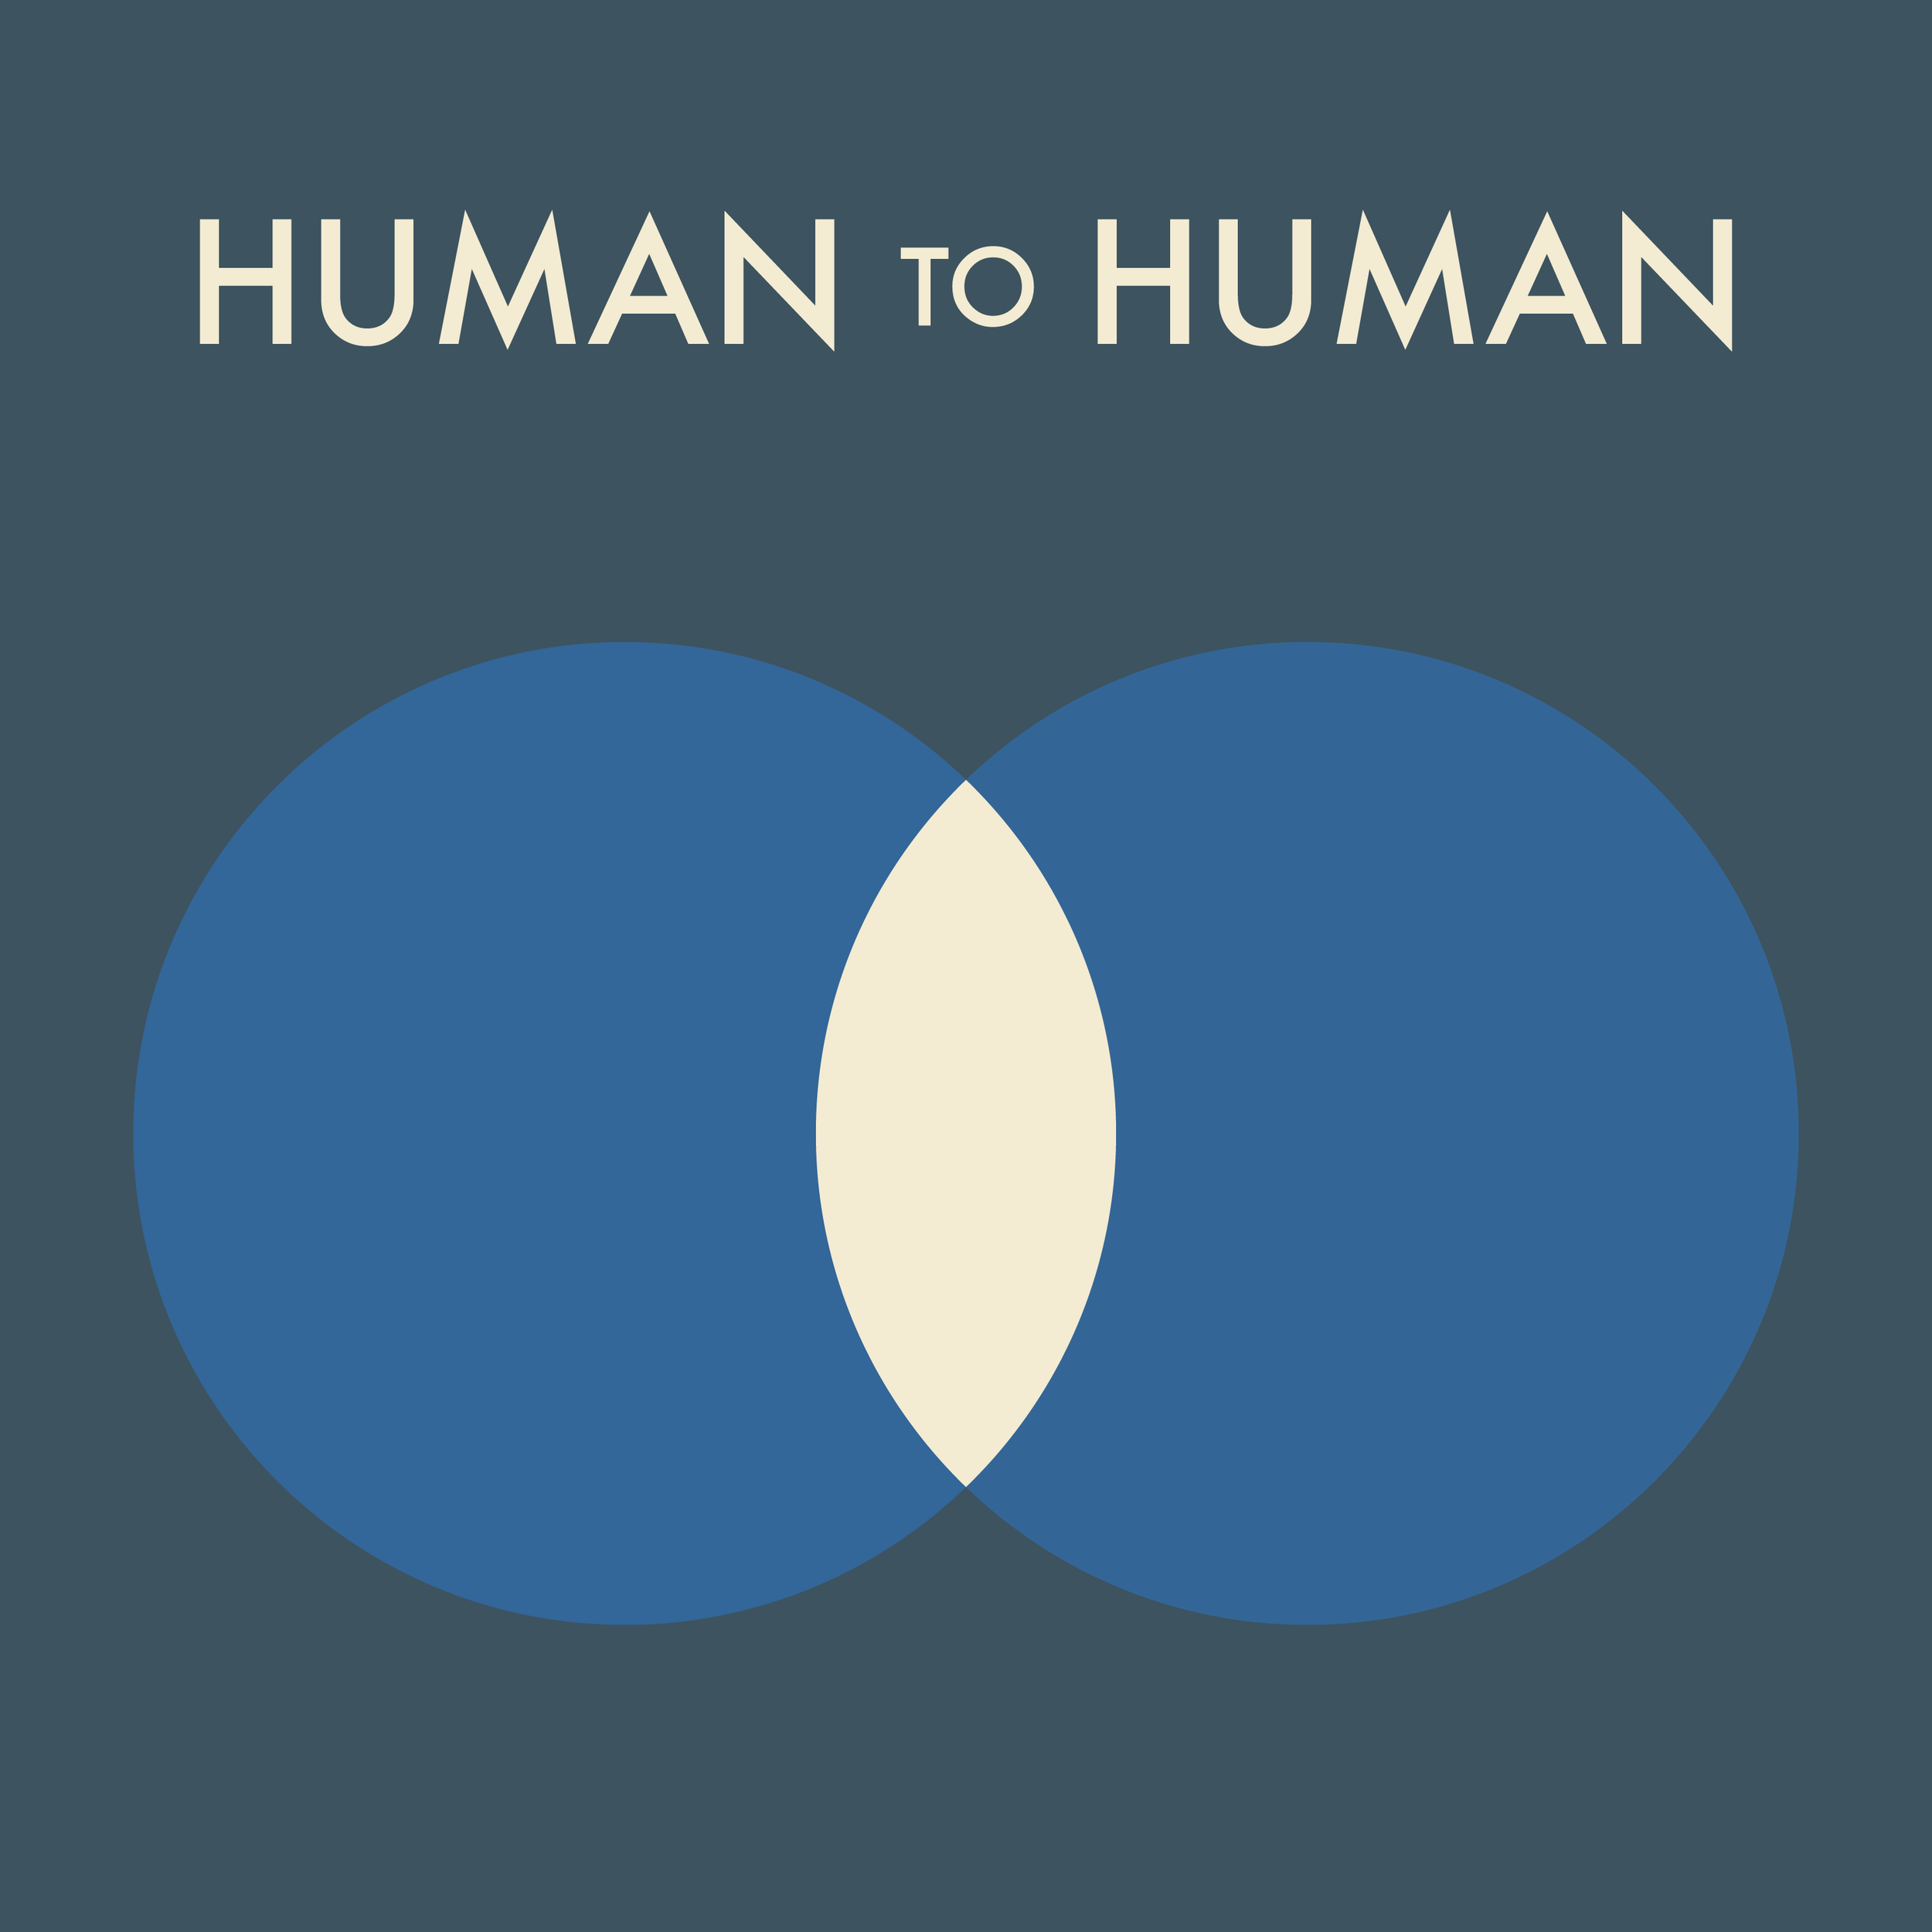 Human_Podcast_Art_3000x3000.png